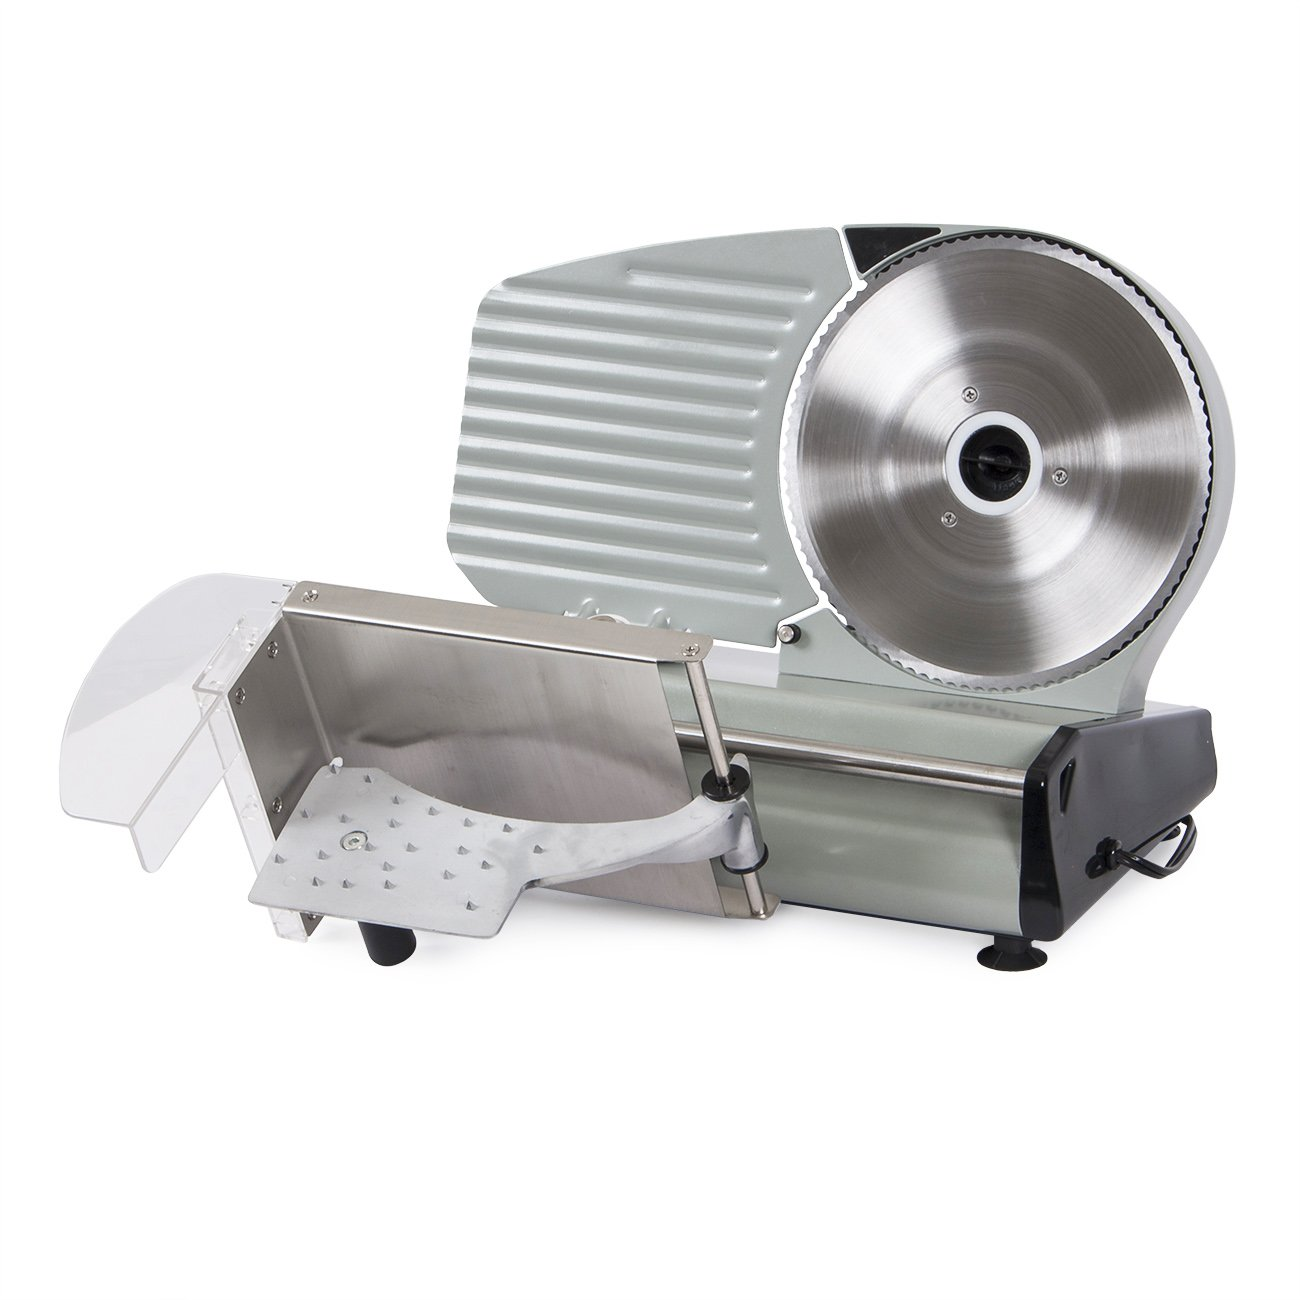 ARKSEN 8.7 -inch Electric Deli Meat Slicer Blade Cutter Veggies Kitchen 110V, ETL, CSA Listed